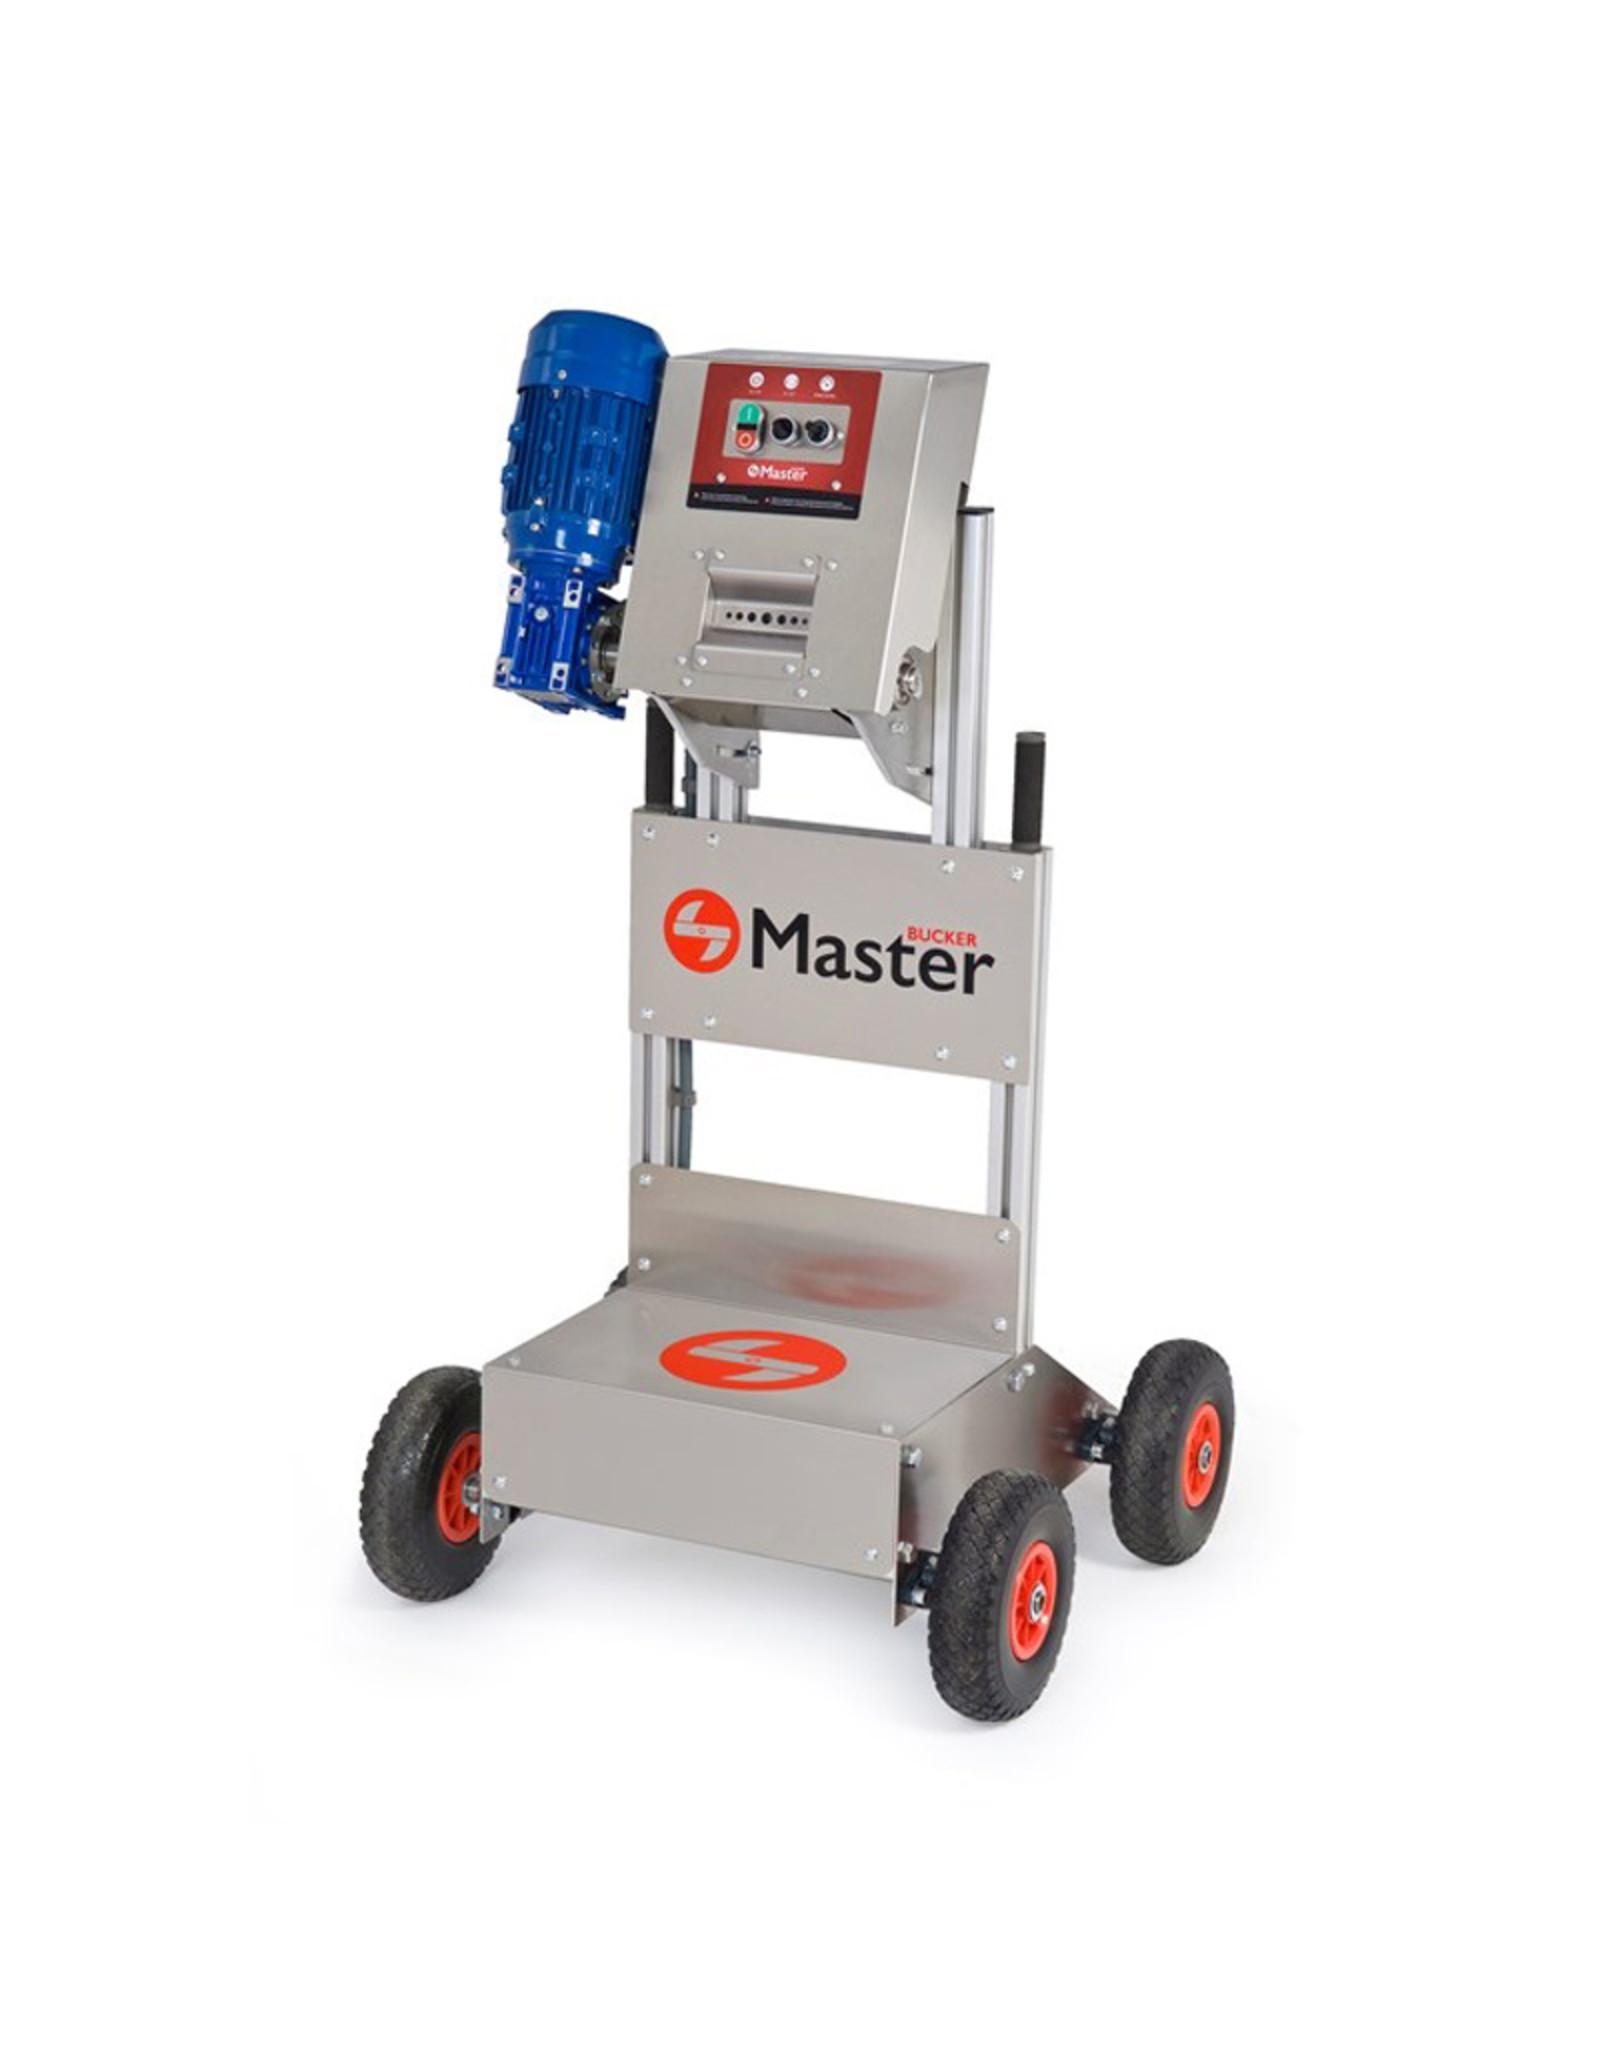 MASTER MASTER TRIMMER MT BUCKER